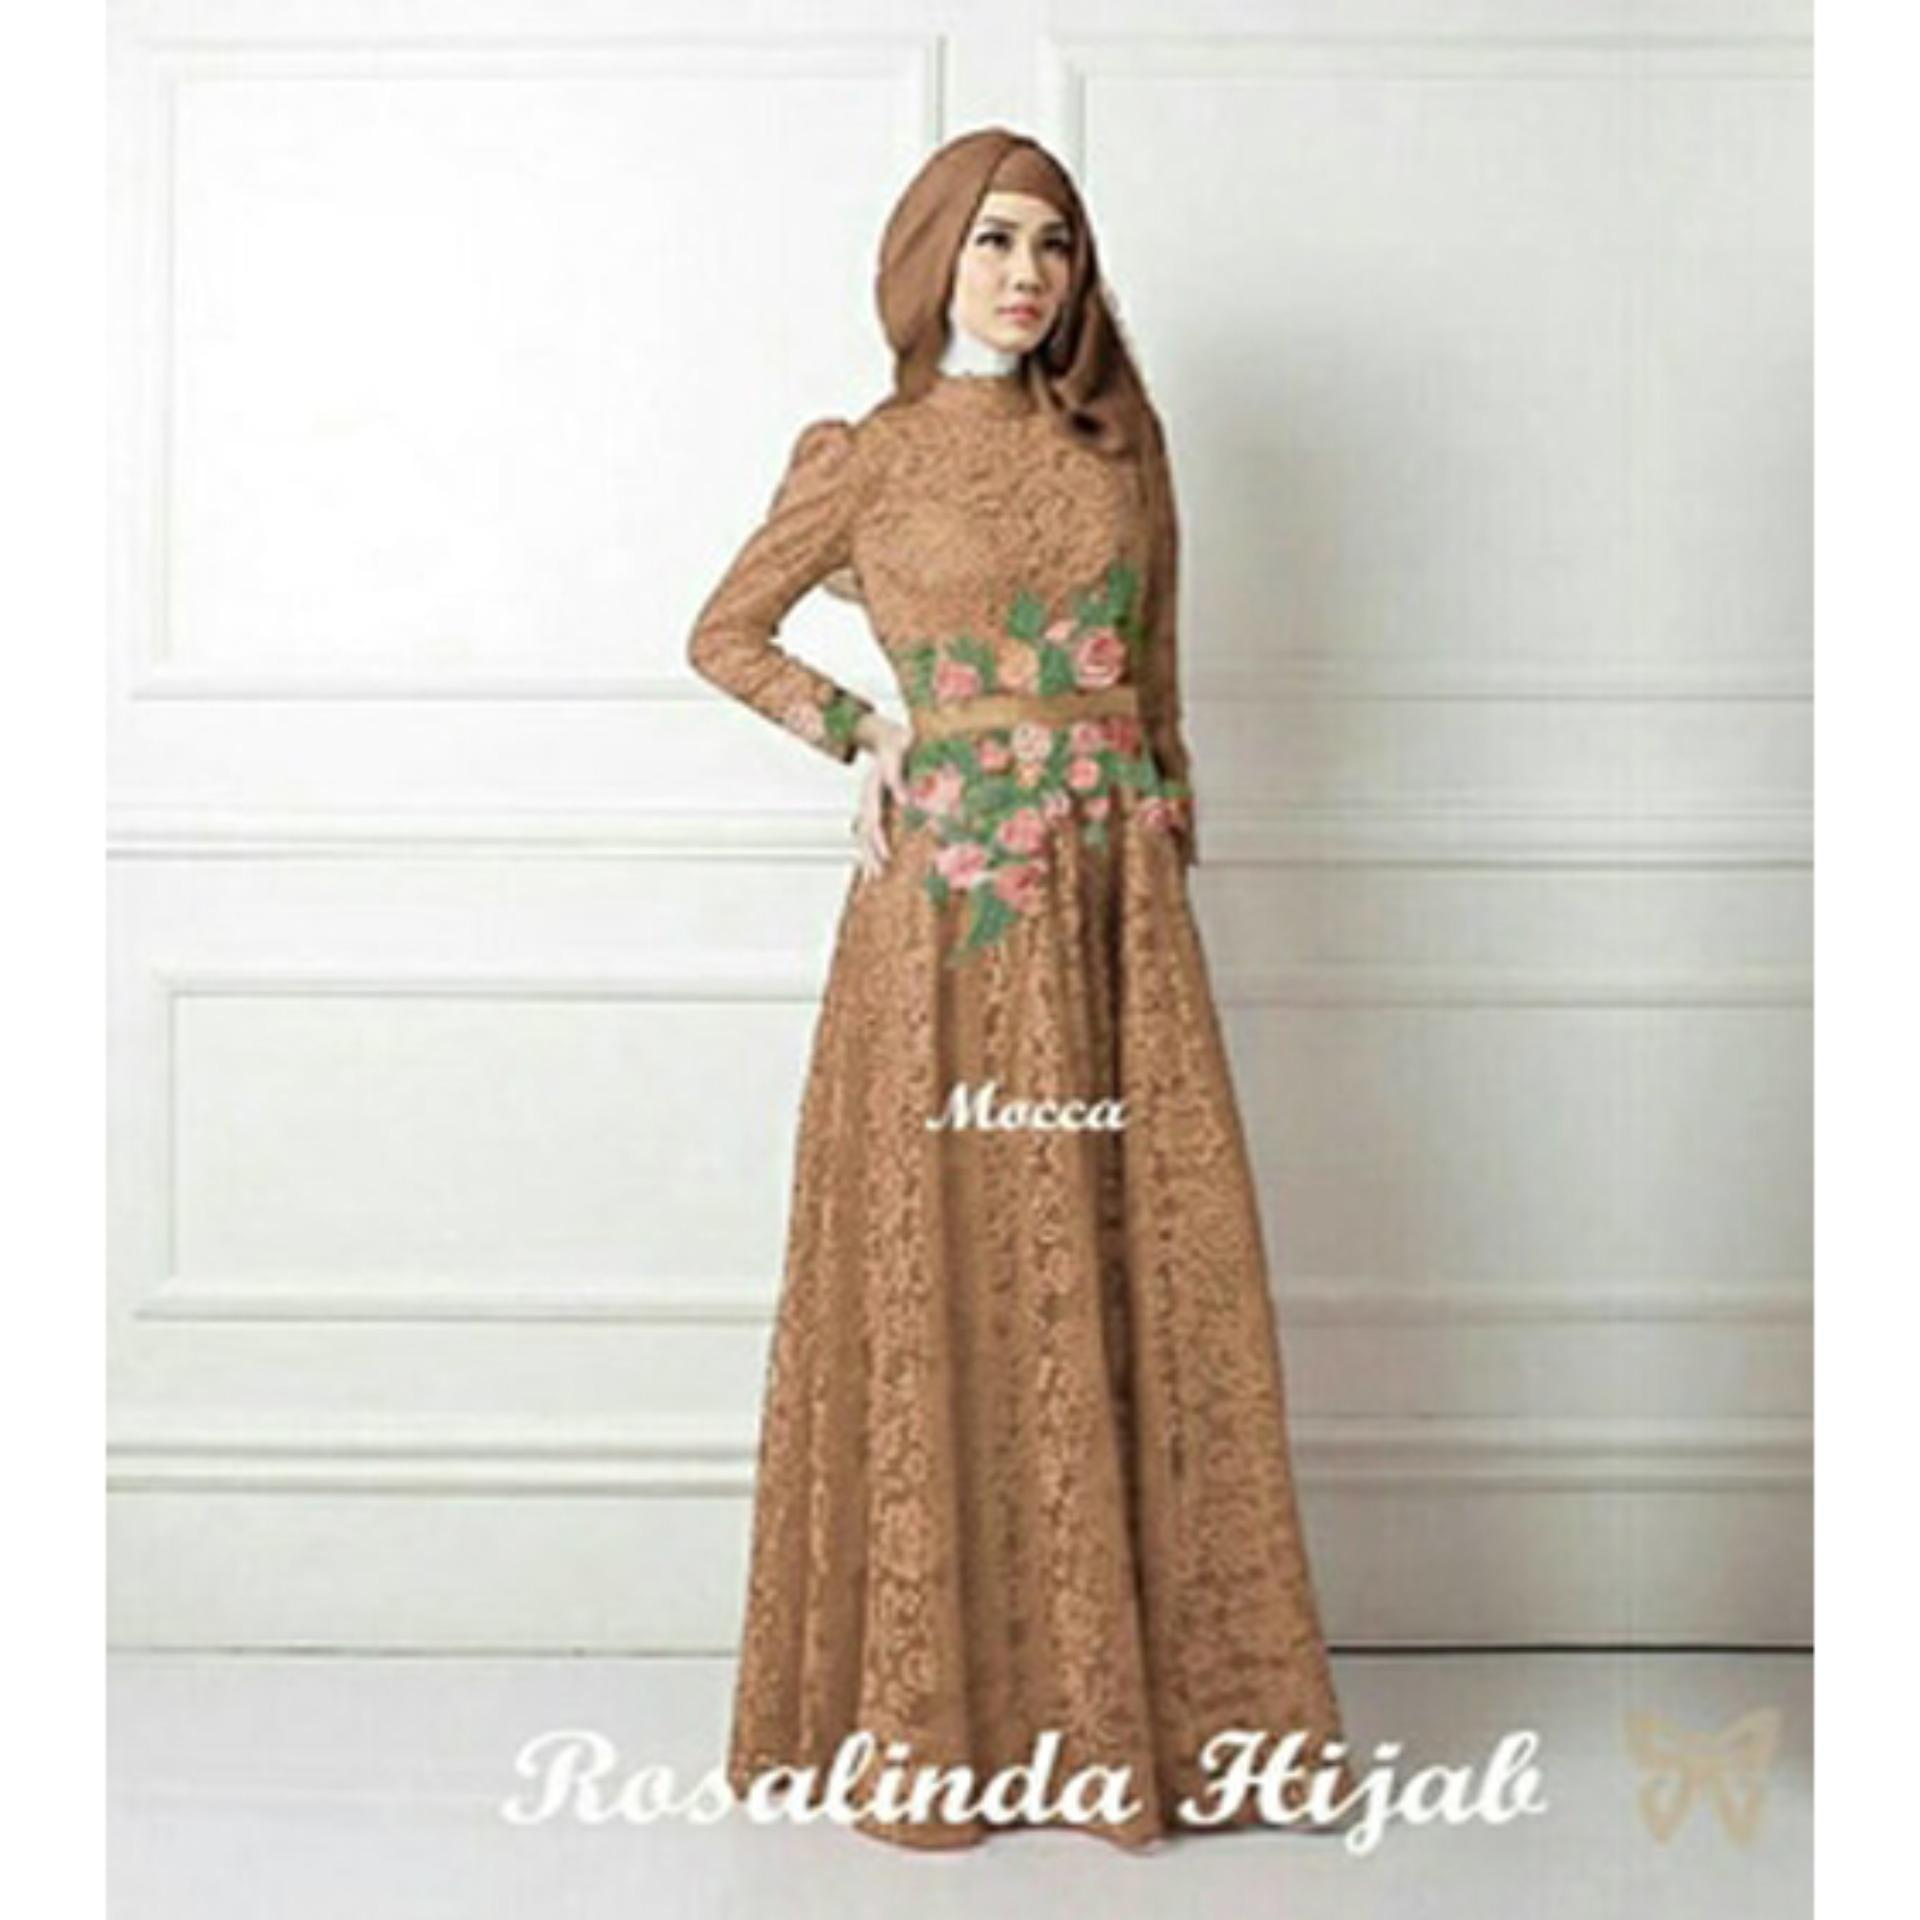 Kehebatan Gamis Syari Pesta Hijab Dress Terbaru Baju Kondangan